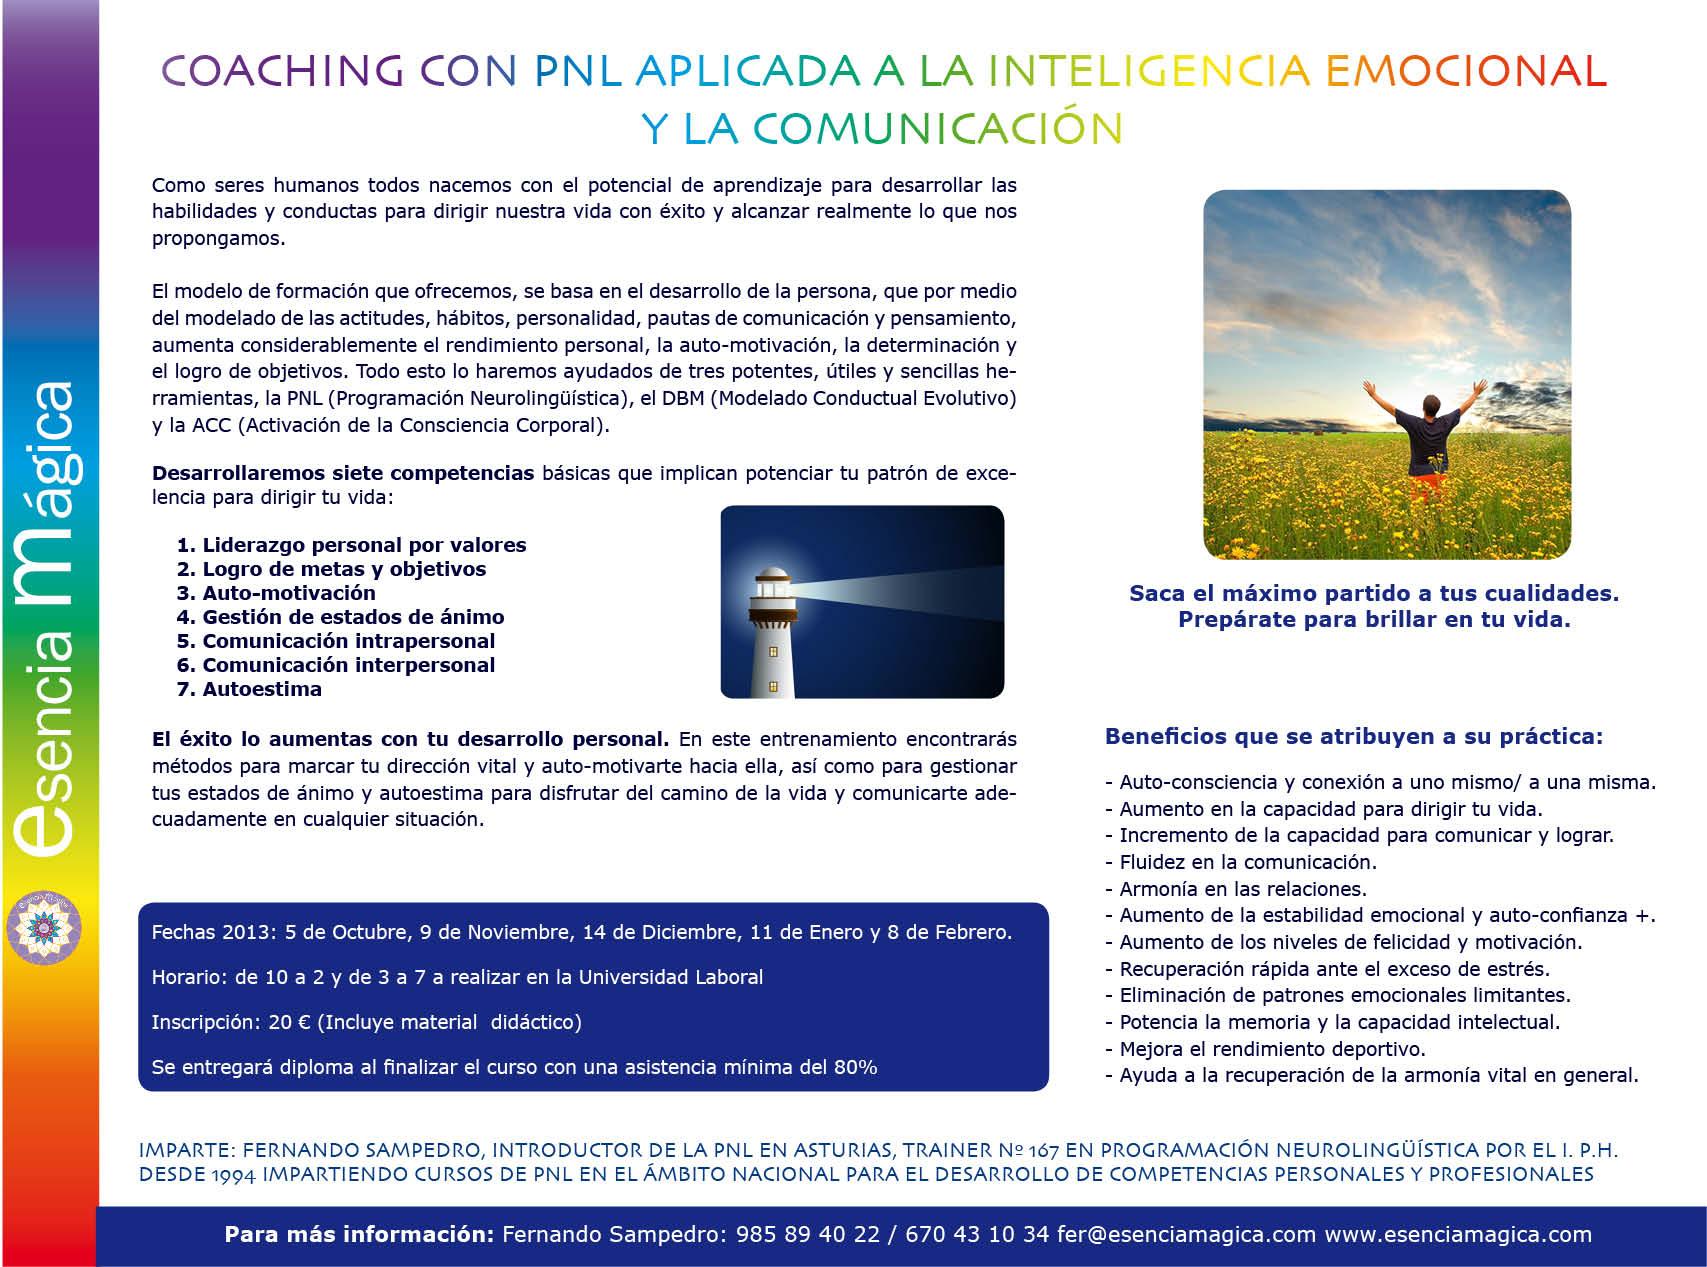 folleto coaching con pnl 2013